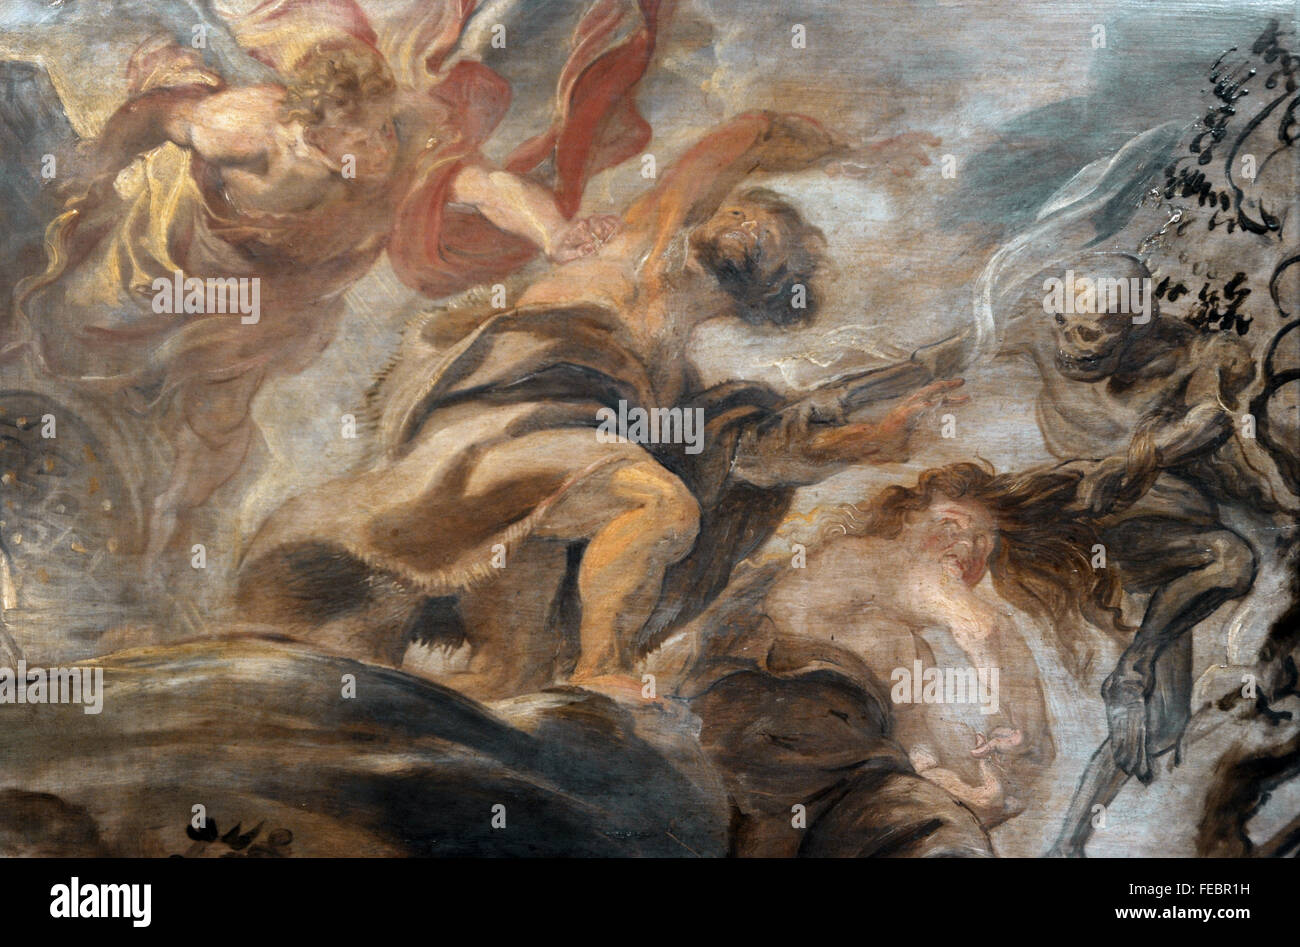 Peter Paul Rubens (1577-1640). Flemish painter. Expulsion from the Garden of Eden, 1620. National Gallery. Prague. - Stock Image